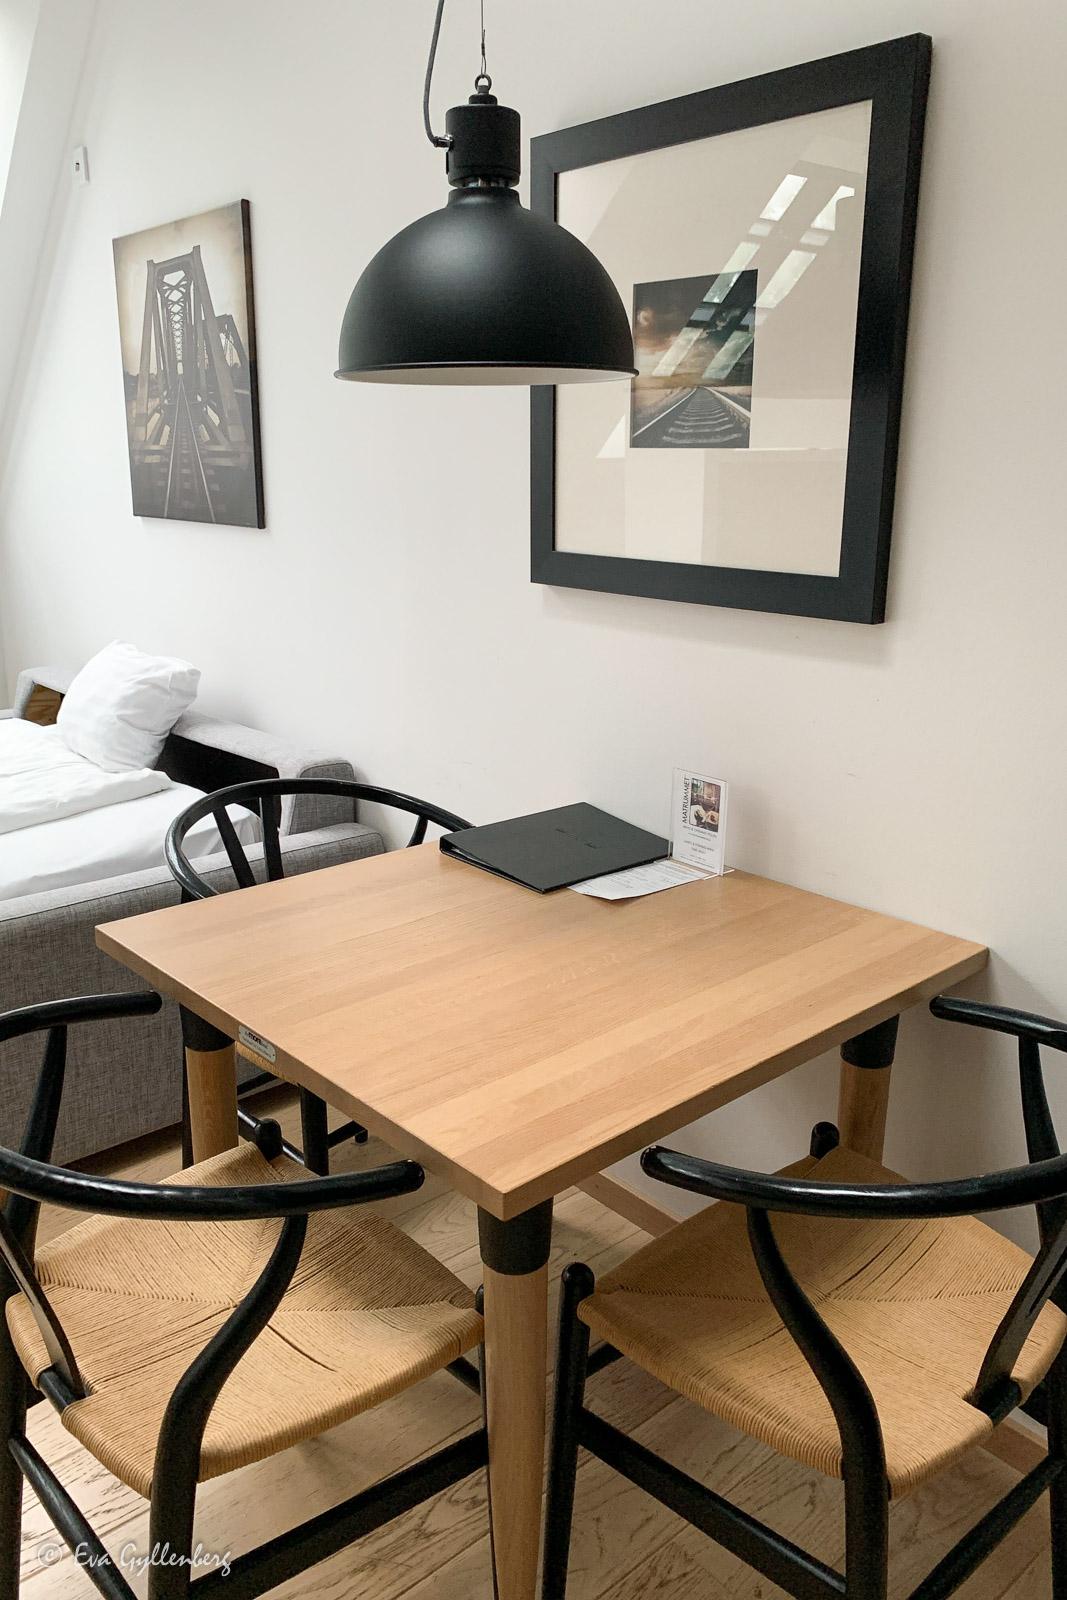 The More Hotel - Snyggt lägenhetshotell i Lund 12